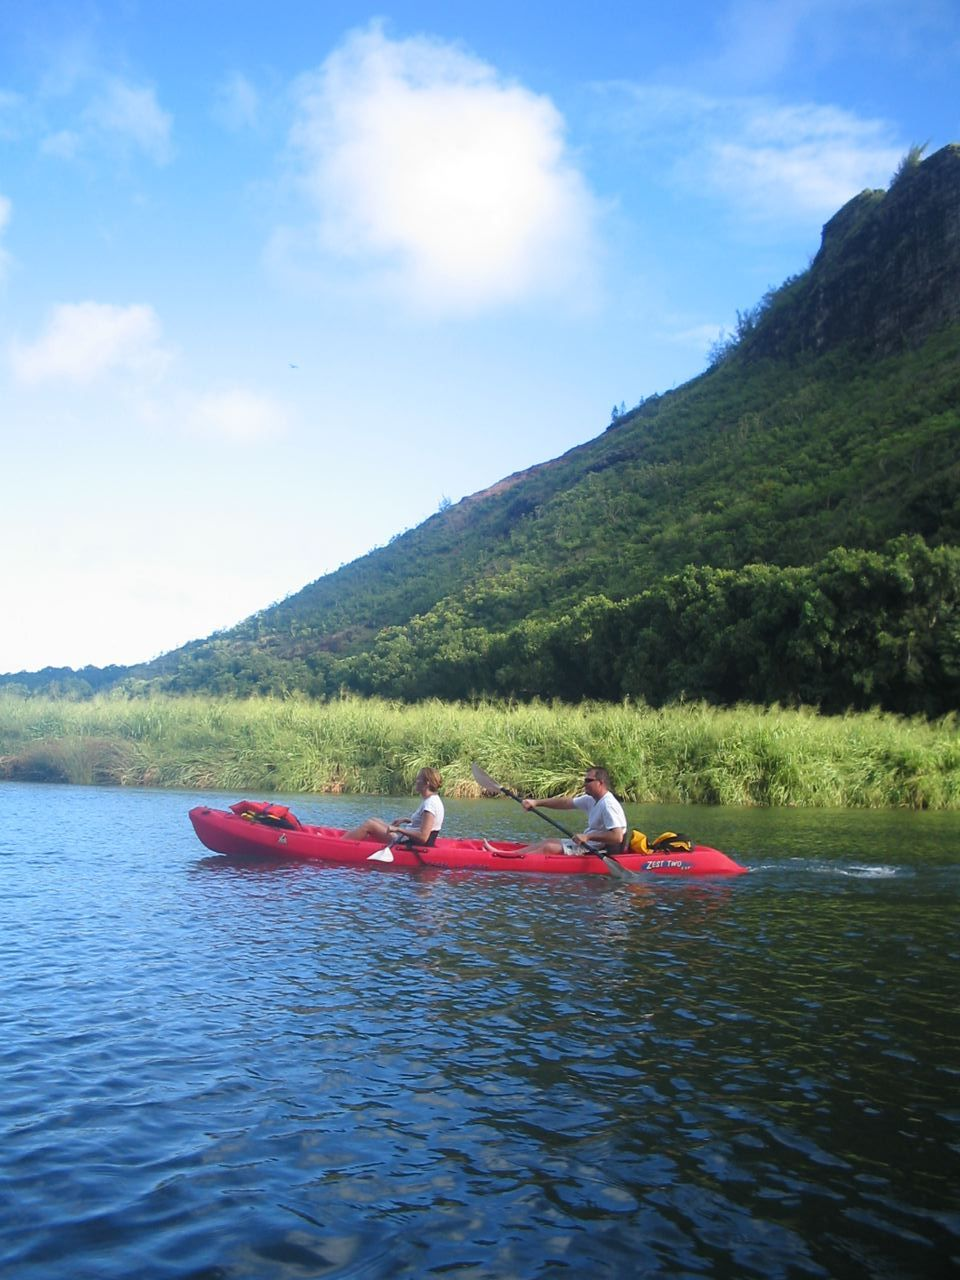 Guided Canoe And Hiking Trips In: Wailua River & Secret Falls